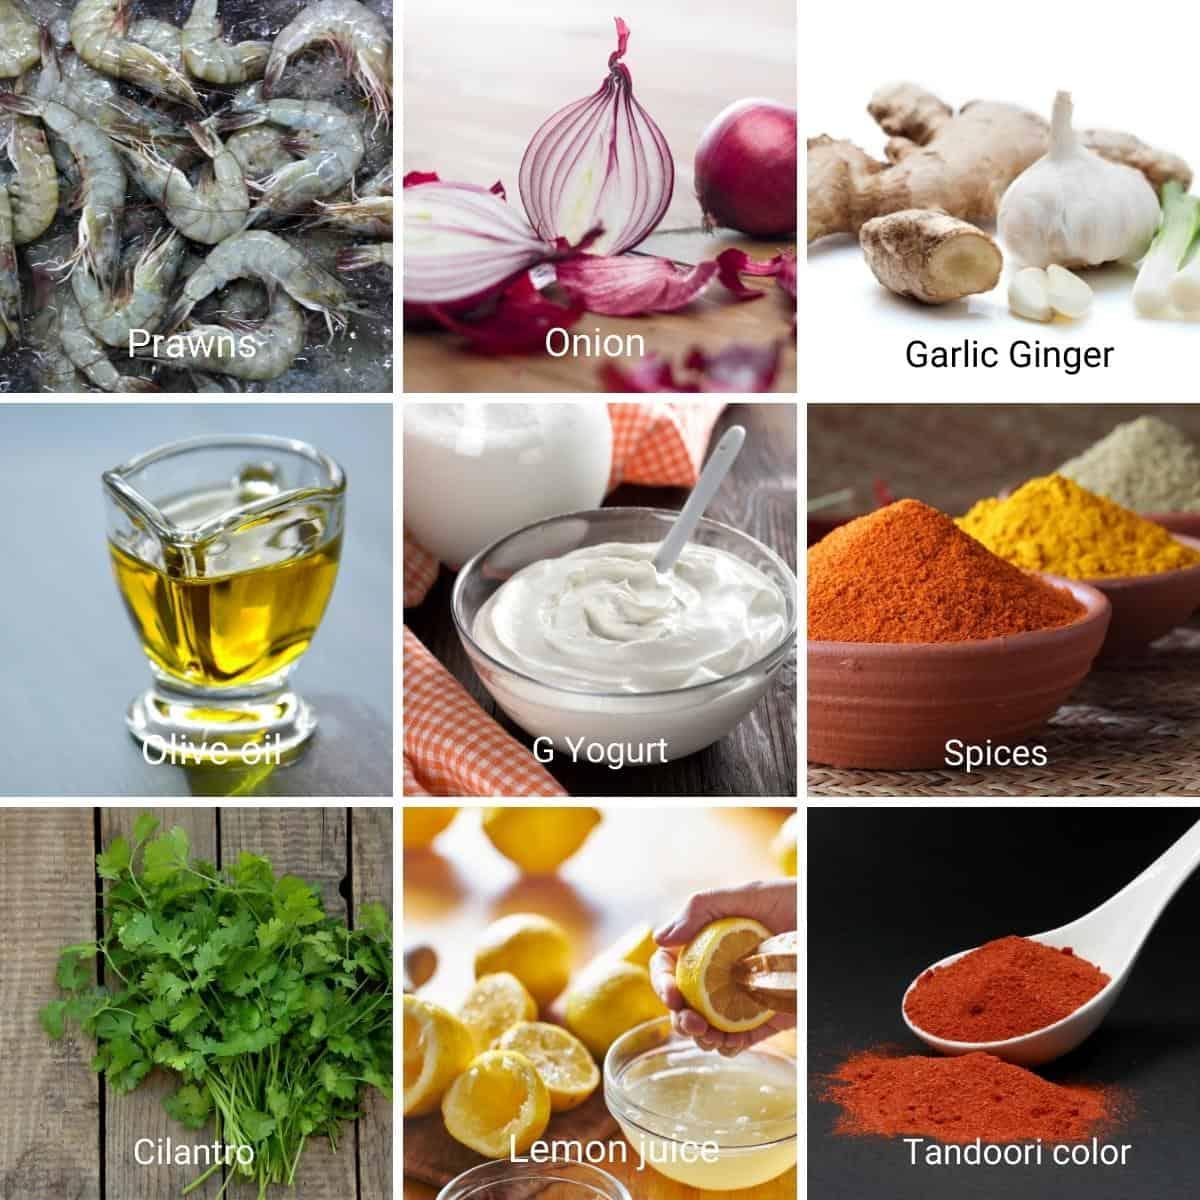 Ingredients for making prawn masala with tandoori marinade